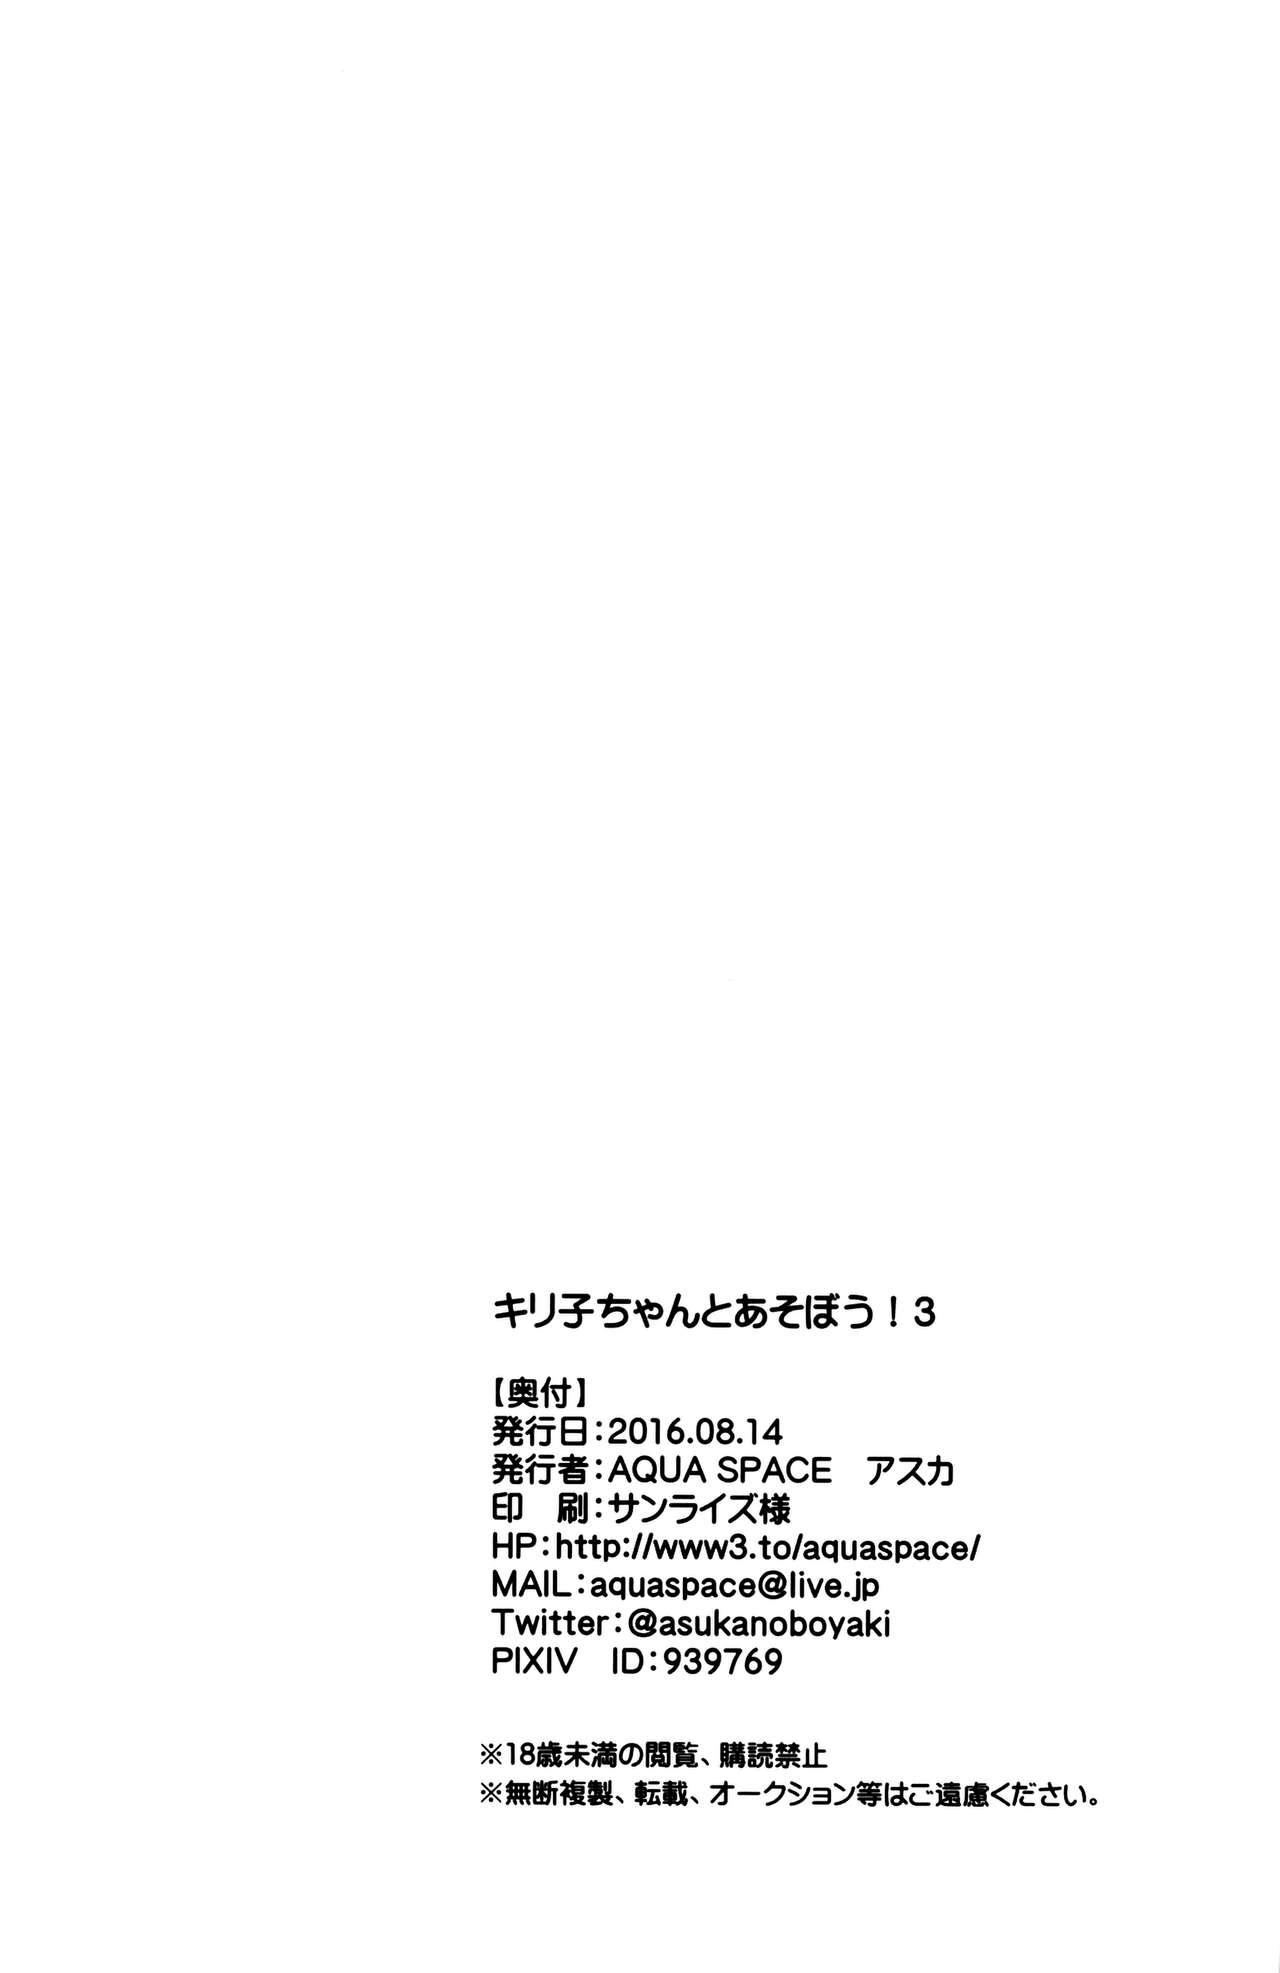 [AQUA SPACE (Asuka)] Kiriko-chan to Asobou! 3 | Let's play with Kiriko-chan! 3 (Sword Art Online) [English] [EHCOVE] [Digital] 16